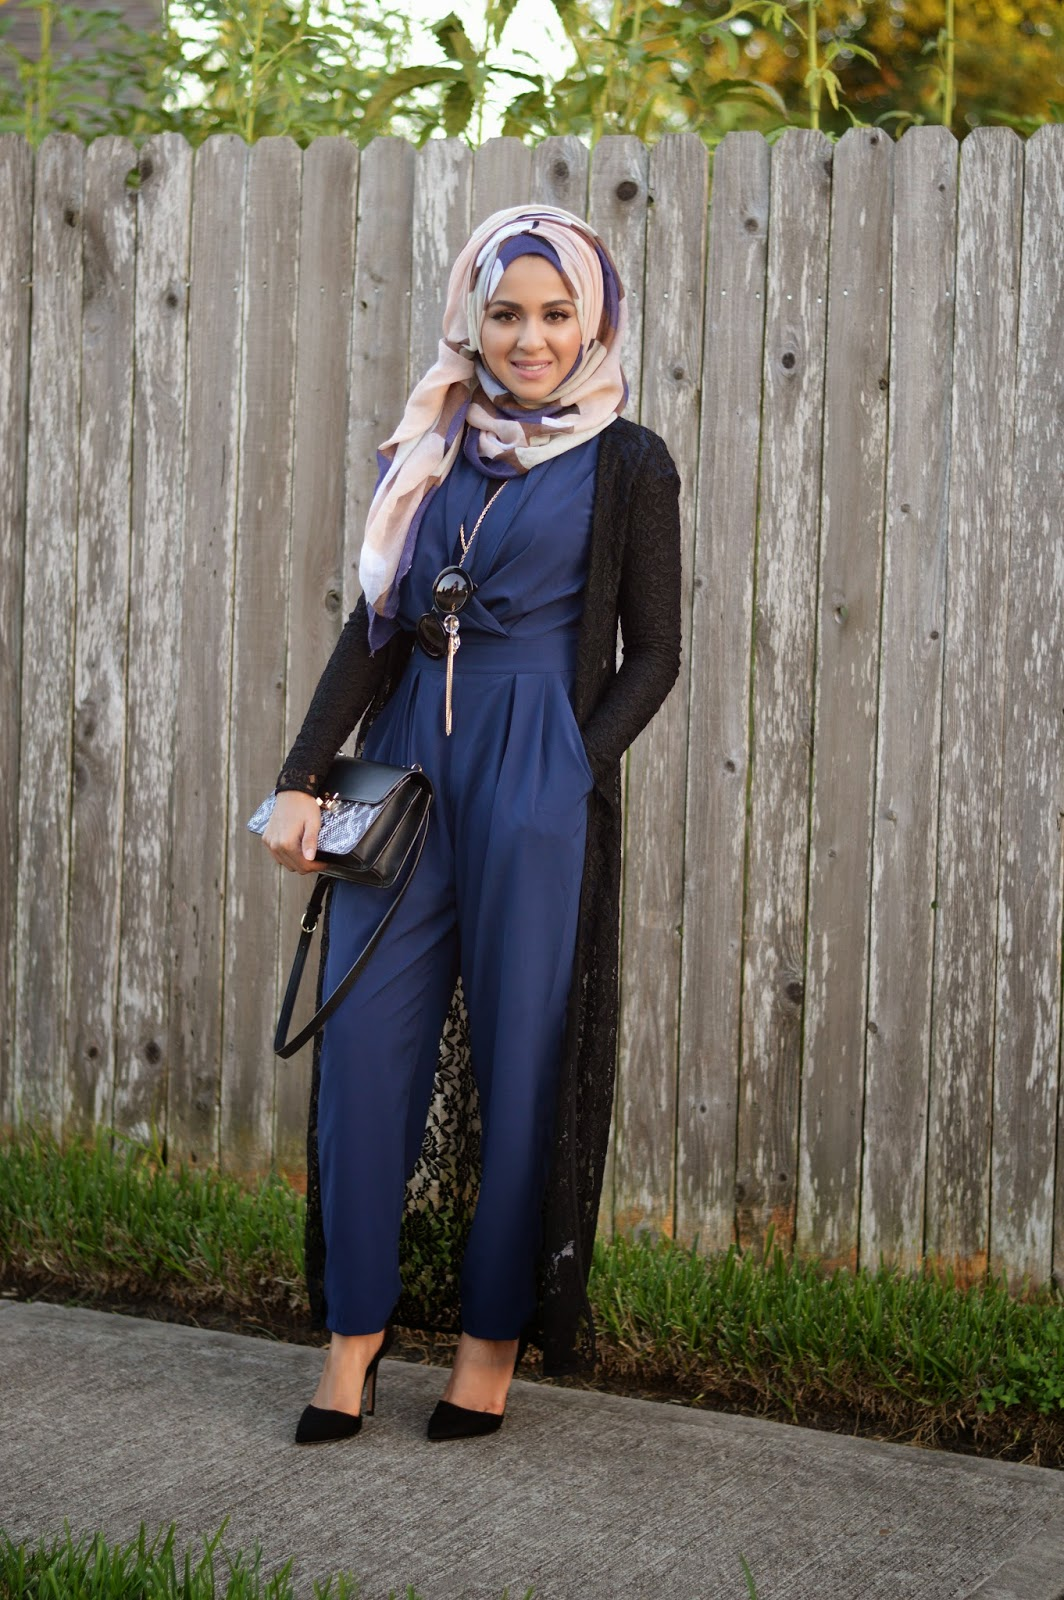 35c63ace39461 افضل و اخر عدد من مجلة حجاب فاشون 2019